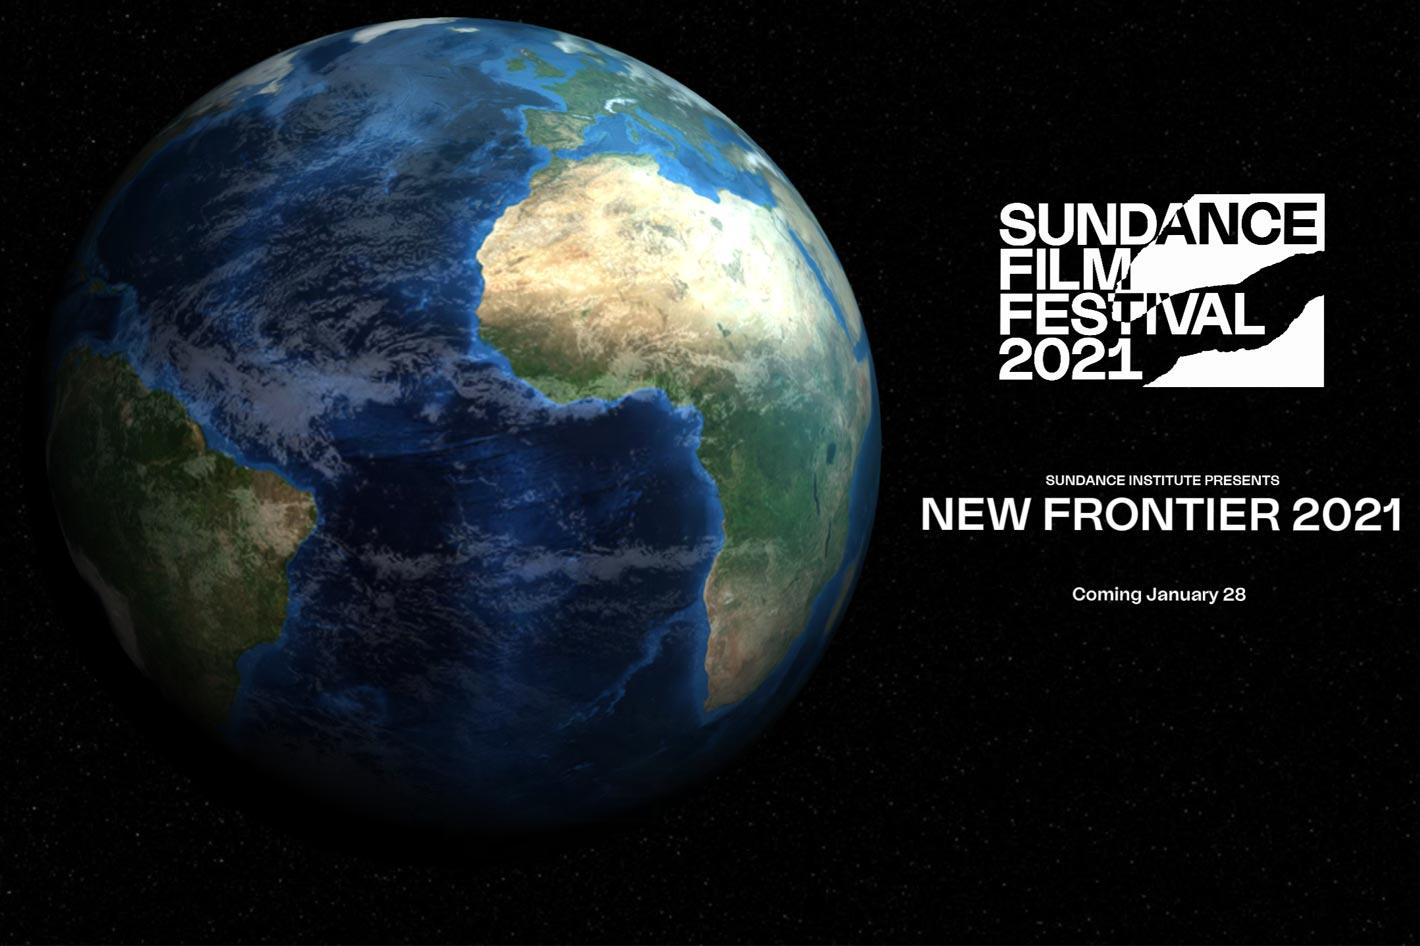 2021 Sundance Film Festival: VR at the New Frontier